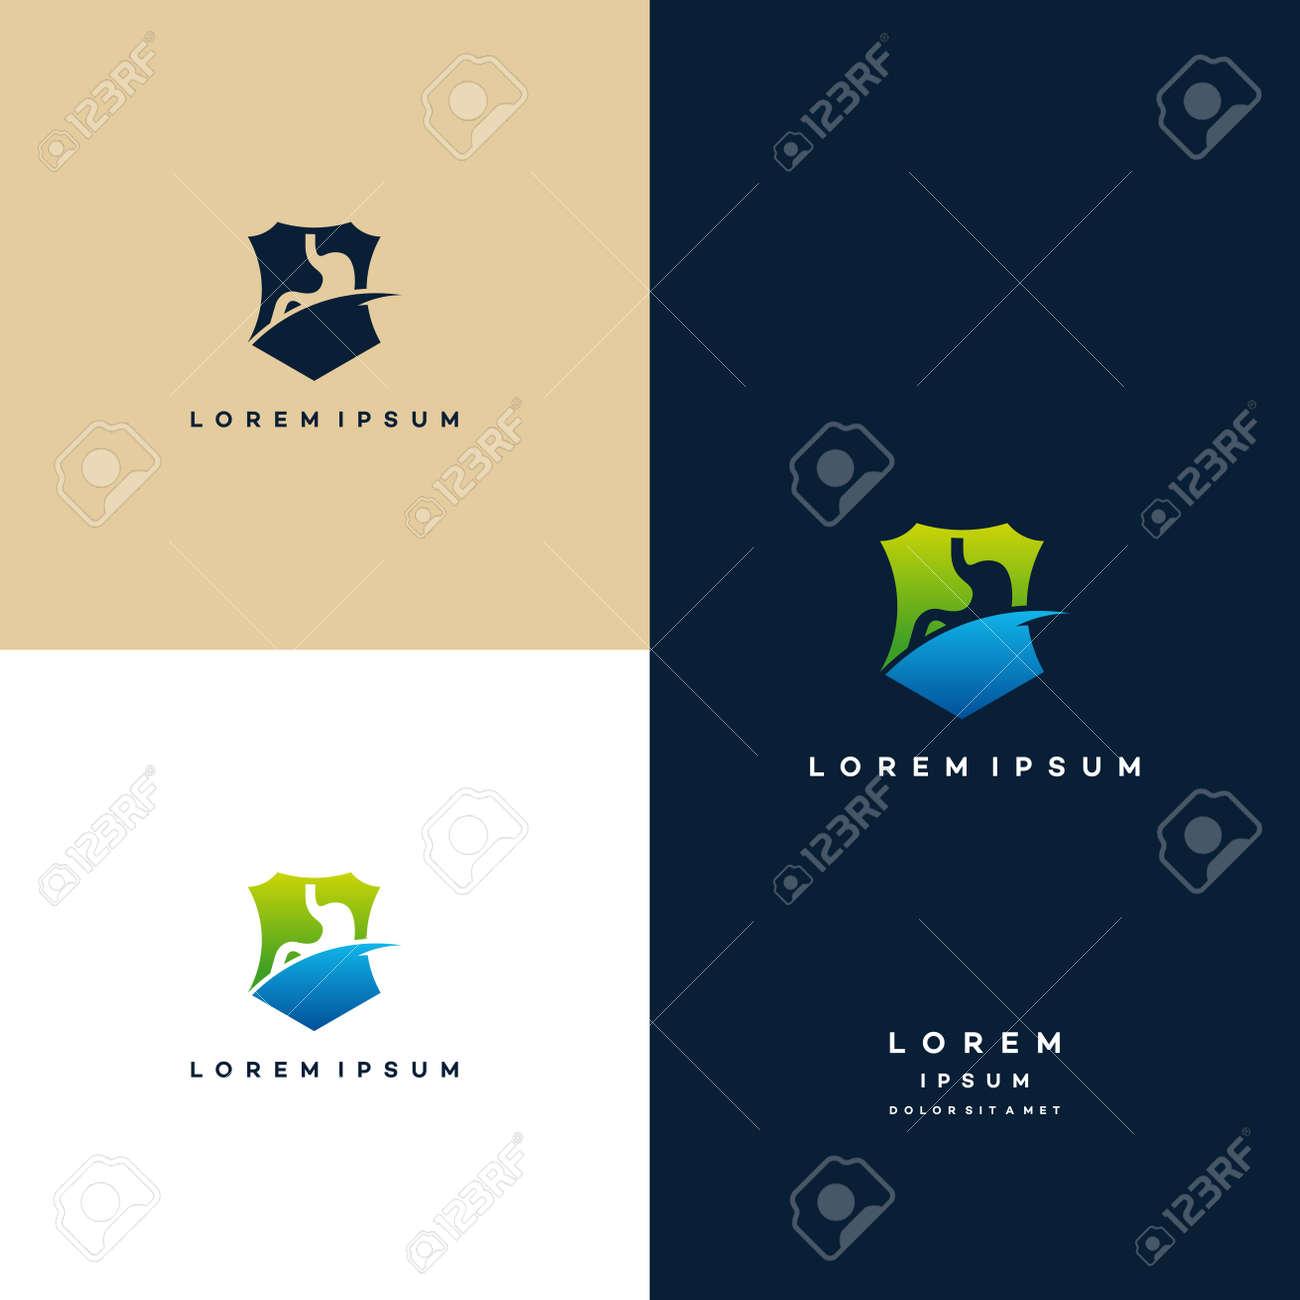 Stomach Logo designs, Colorful Stomach logo designs concept vector - 168021132